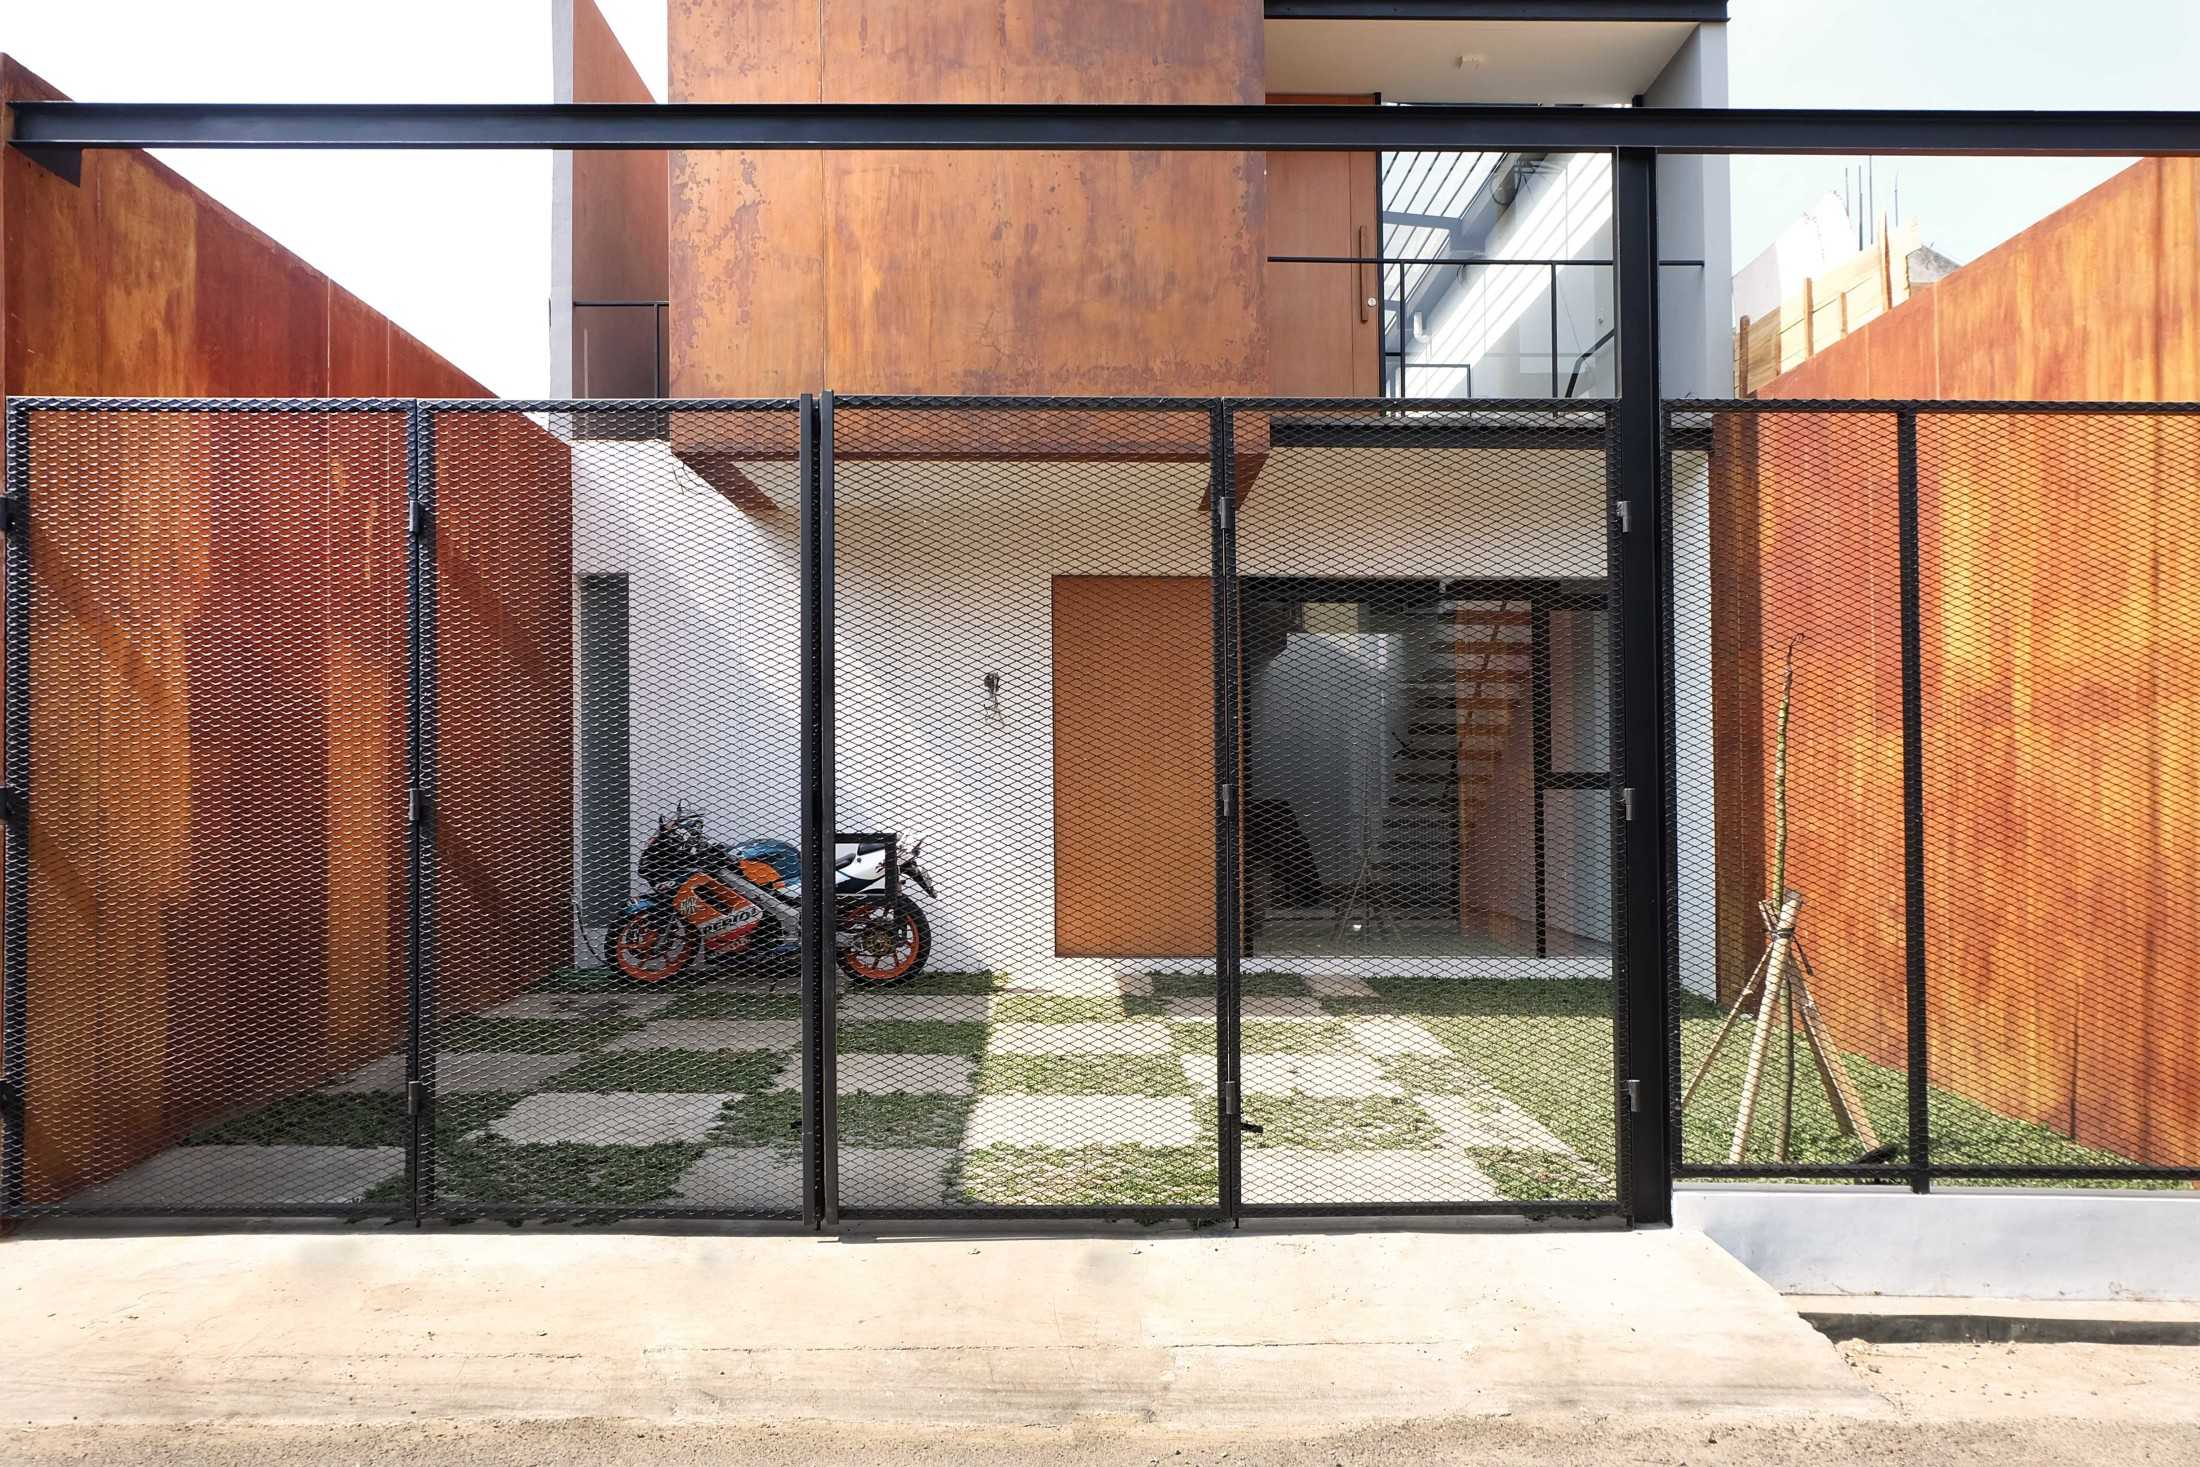 Dica Selaras 105 House Antapani, Kota Bandung, Jawa Barat, Indonesia Antapani, Kota Bandung, Jawa Barat, Indonesia Dica-Selaras-105-House  62314